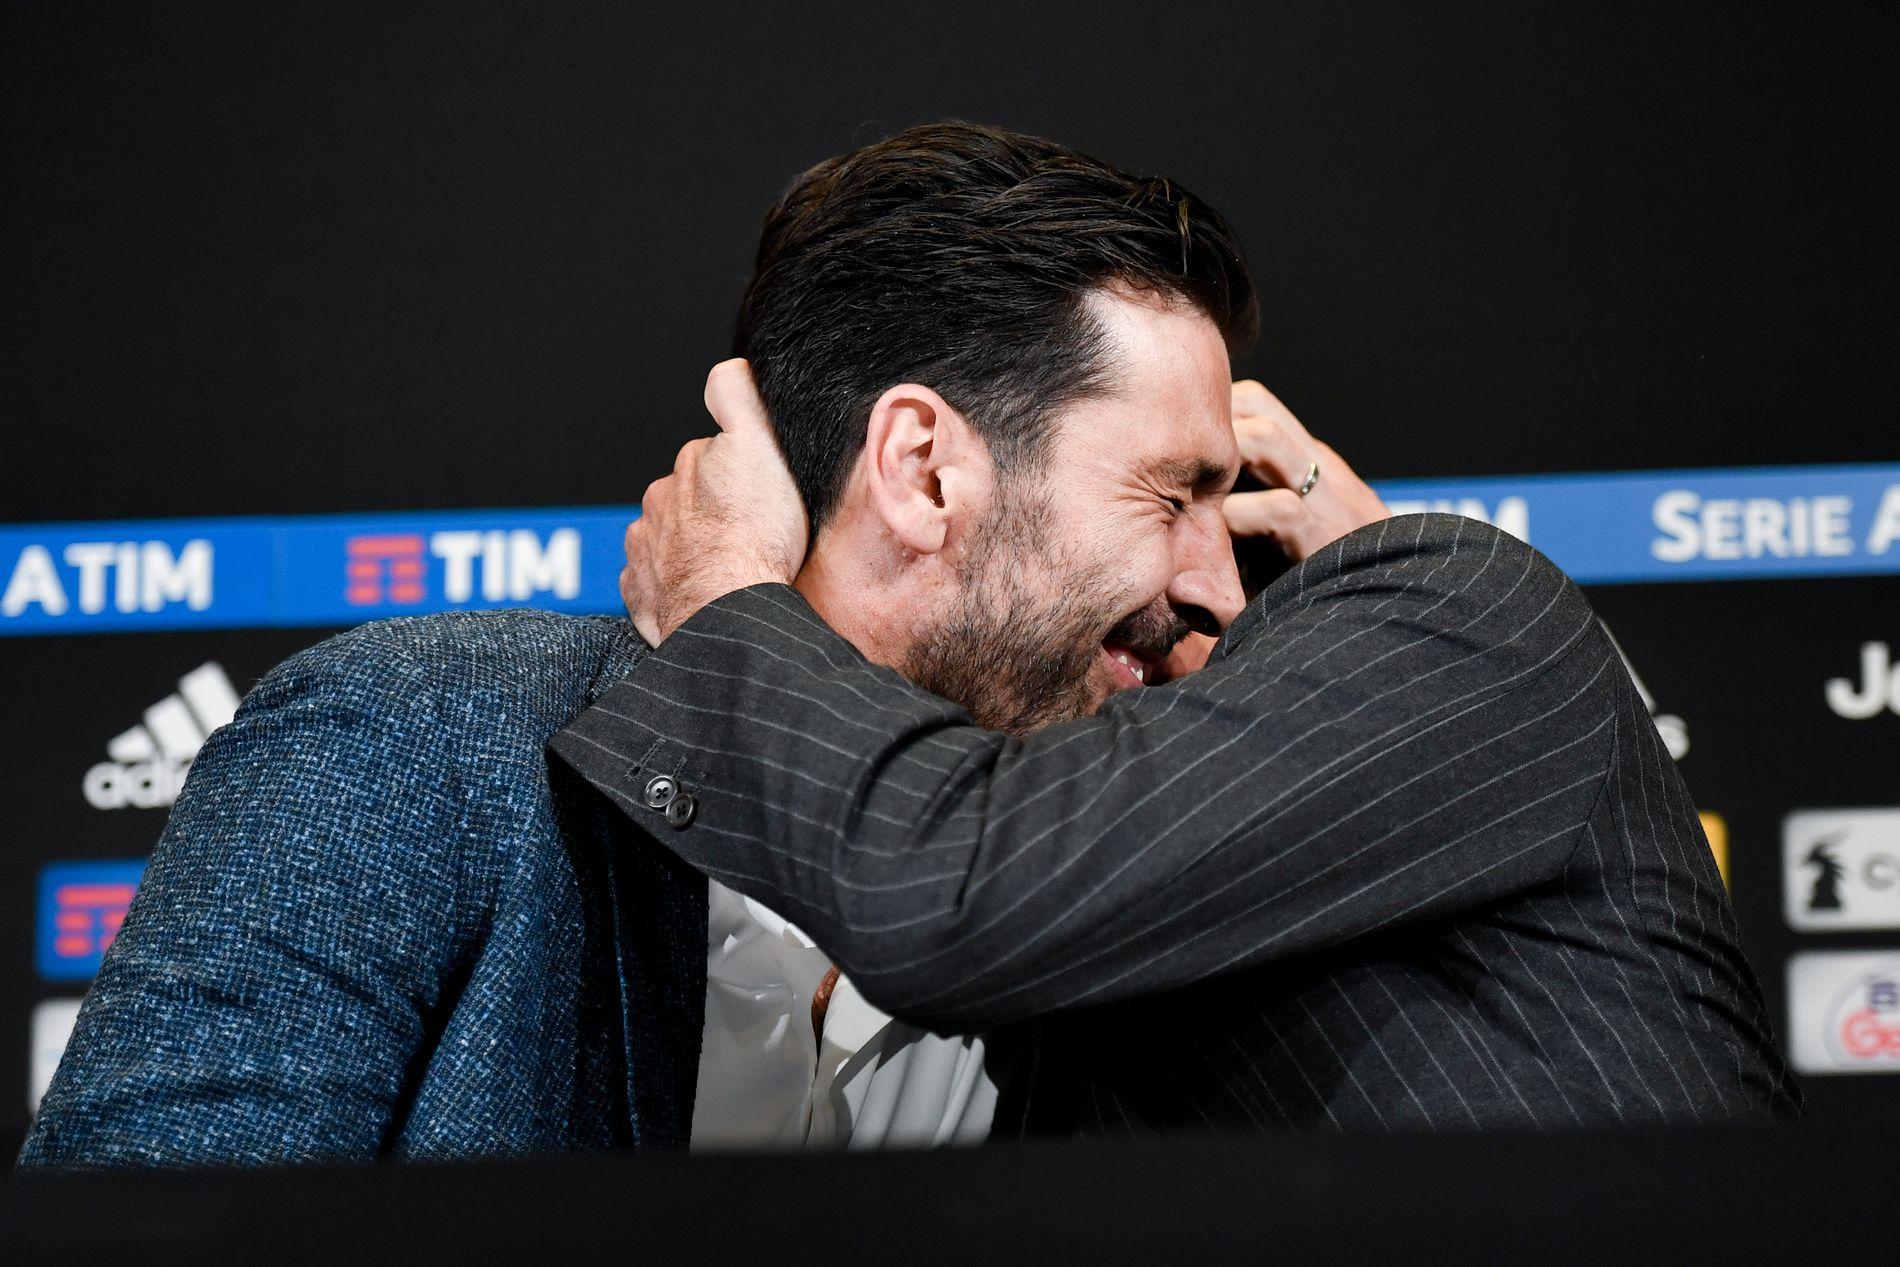 GOD KLEM: Gianluigi Buffon og Andrea Agnelli under torsdagens pressekonferanse.